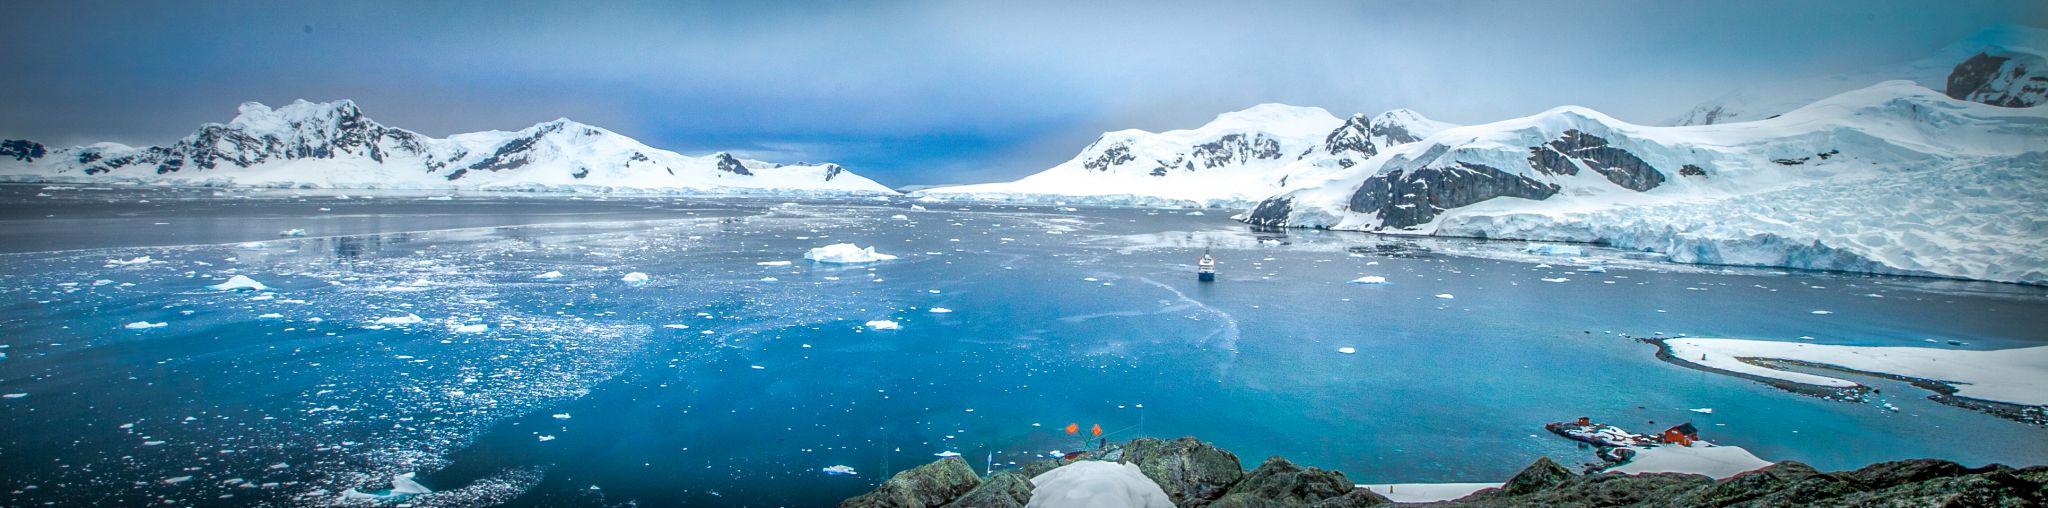 Neko Harbour Panorama Antarctica, Antarctica